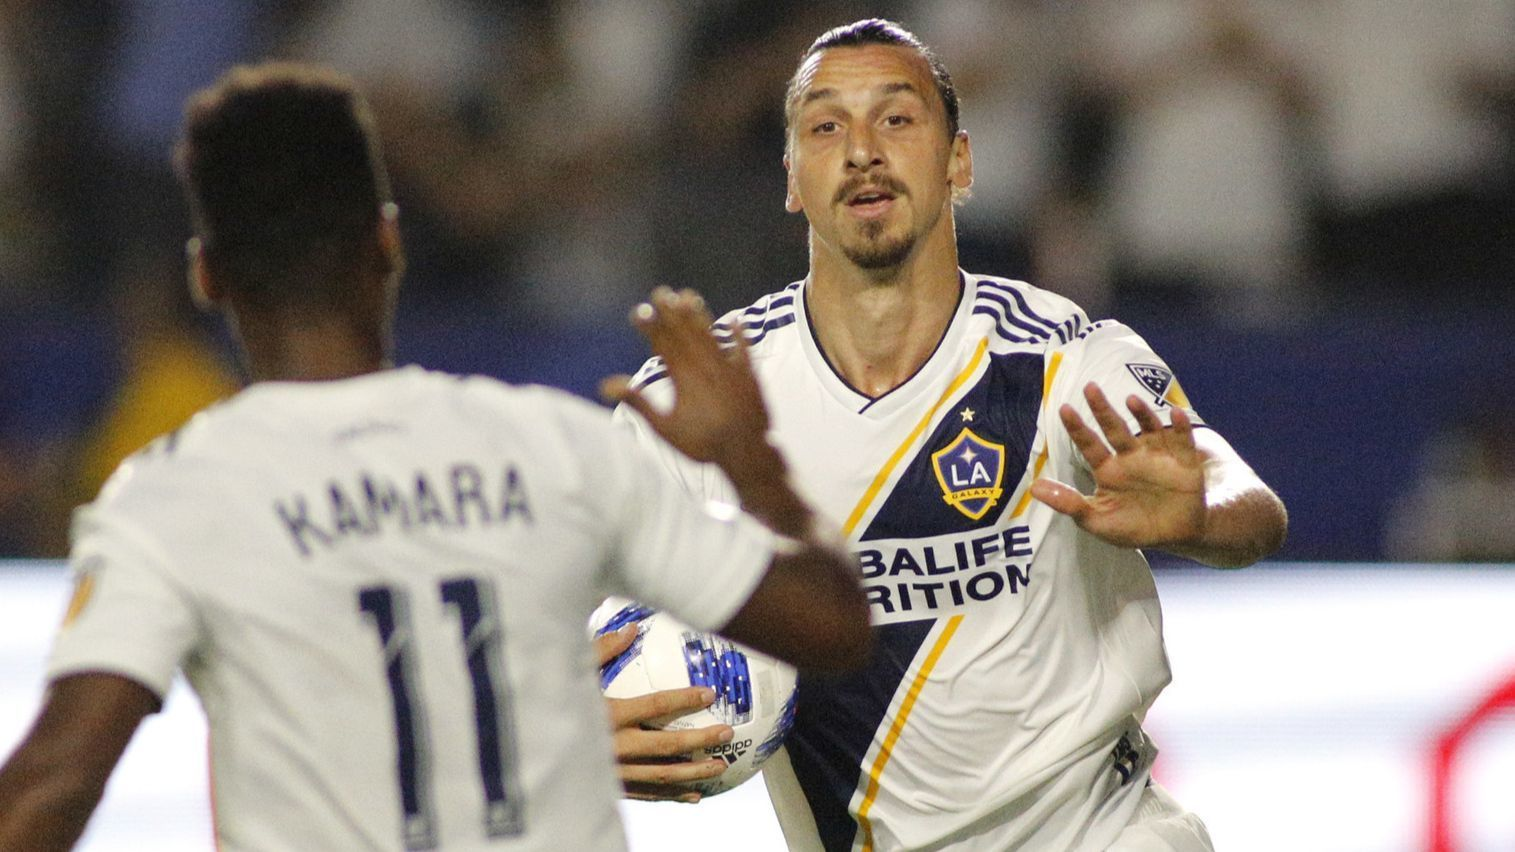 Zlatan Ibrahimovic chasing 500-goal milestone for Galaxy against Minnesota